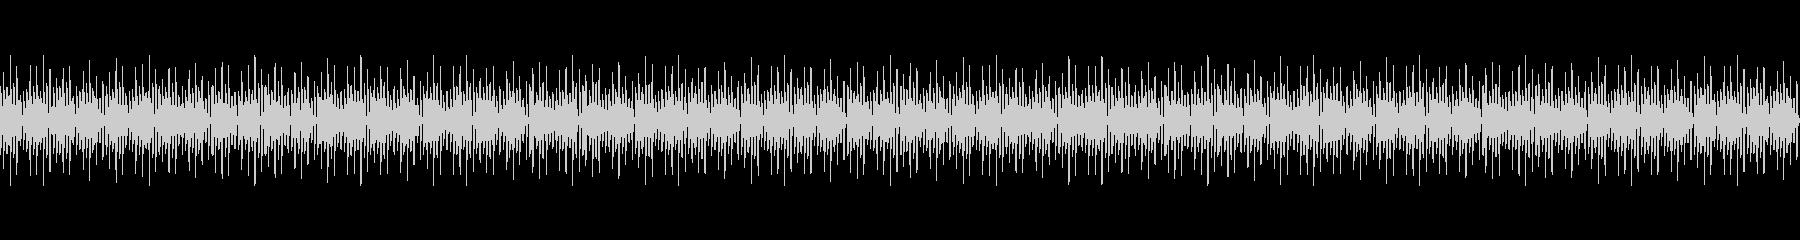 Vtuberの配信 雑談向けBGM(3)の未再生の波形